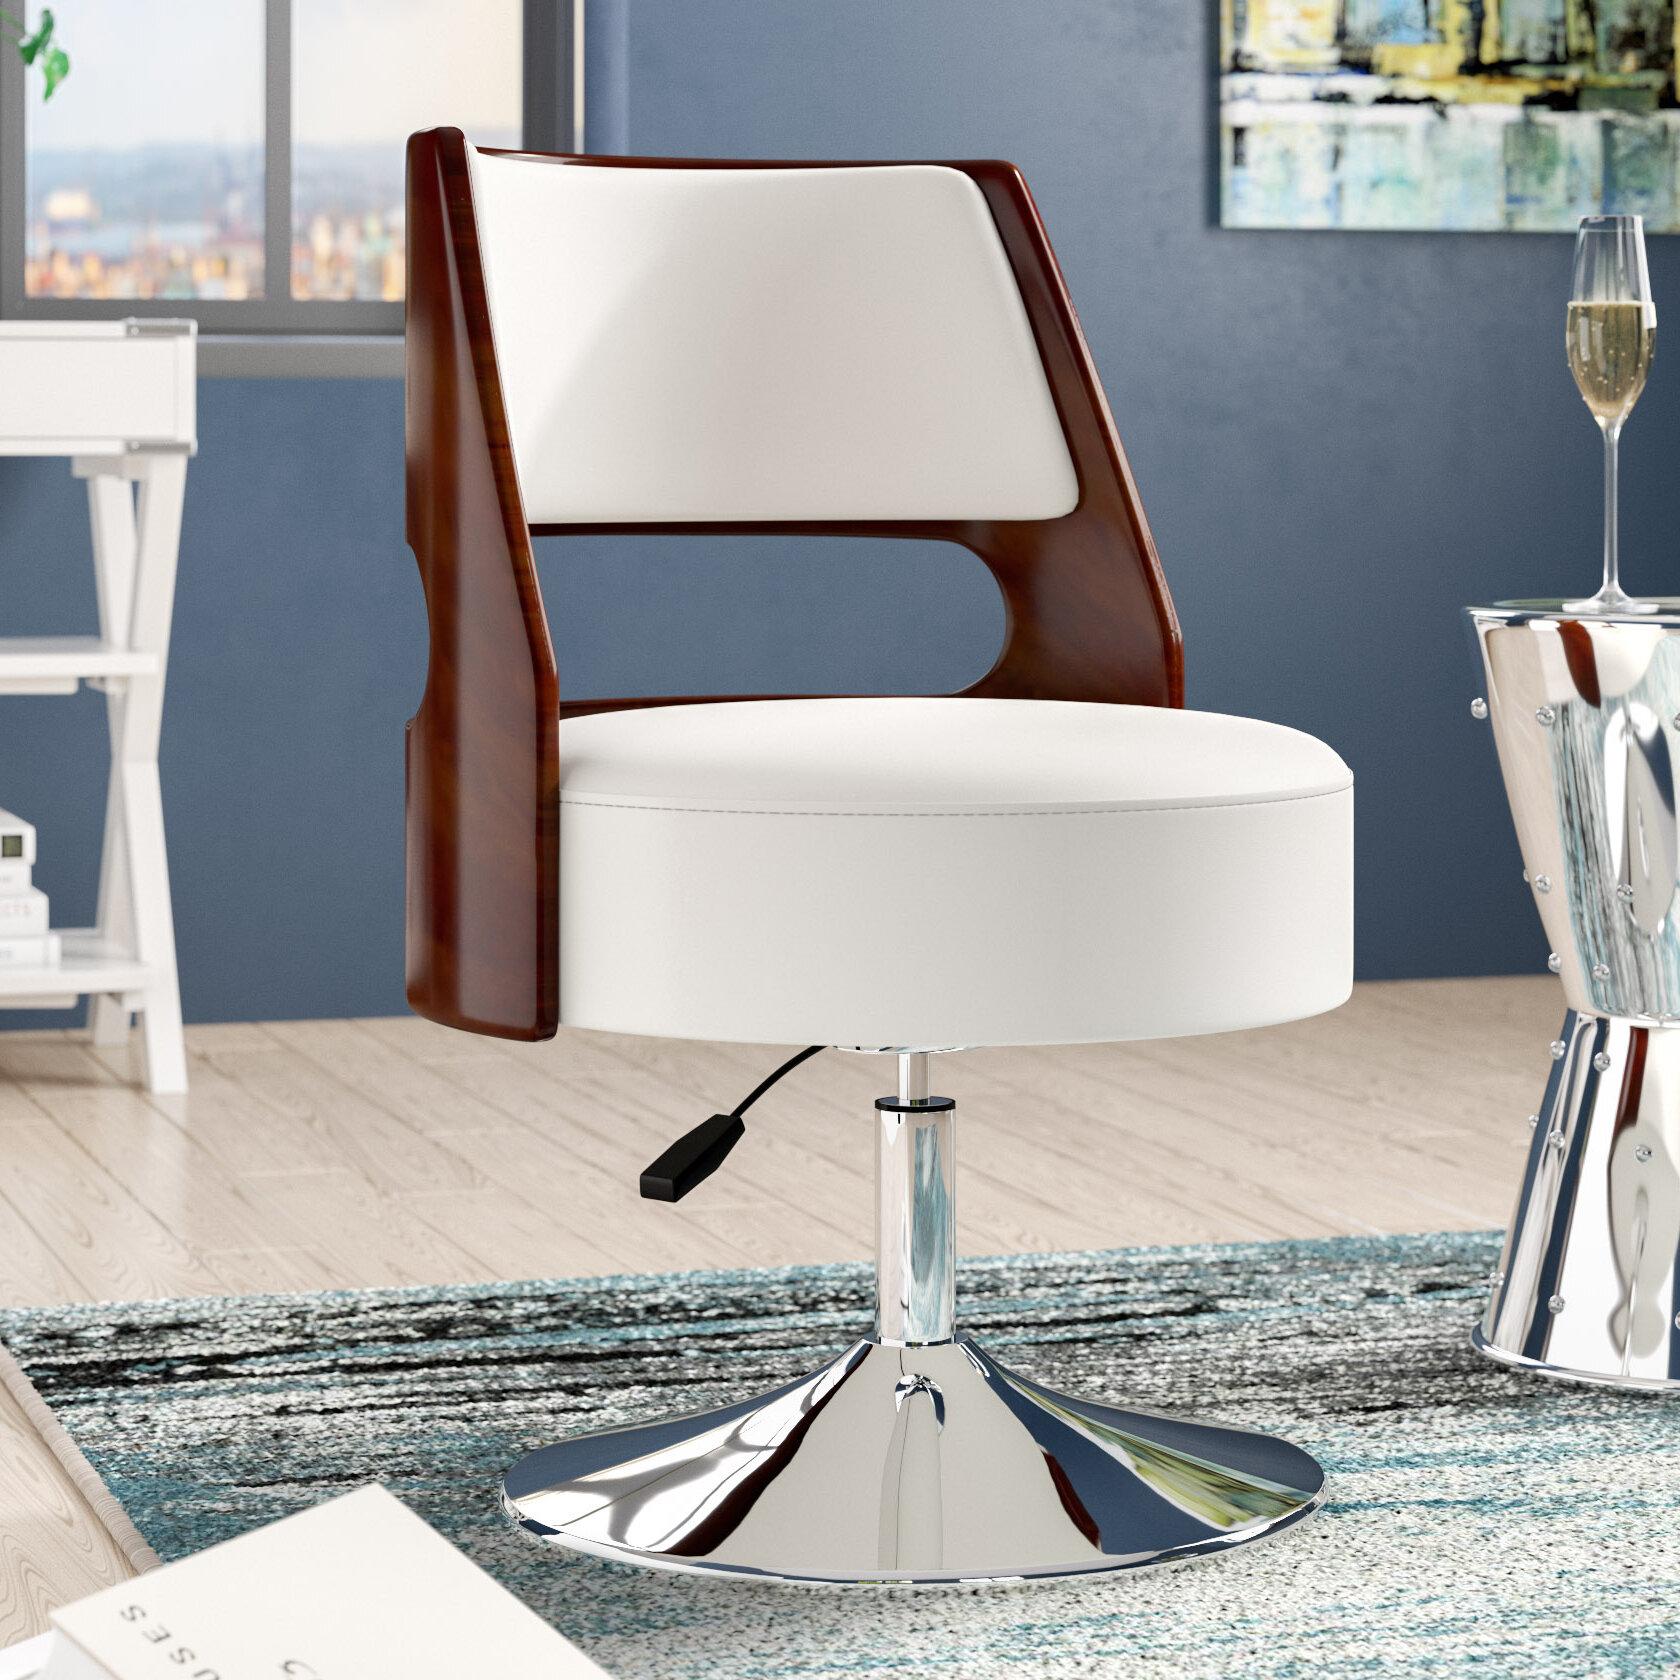 Astounding Raguel Swivel Side Chair Andrewgaddart Wooden Chair Designs For Living Room Andrewgaddartcom